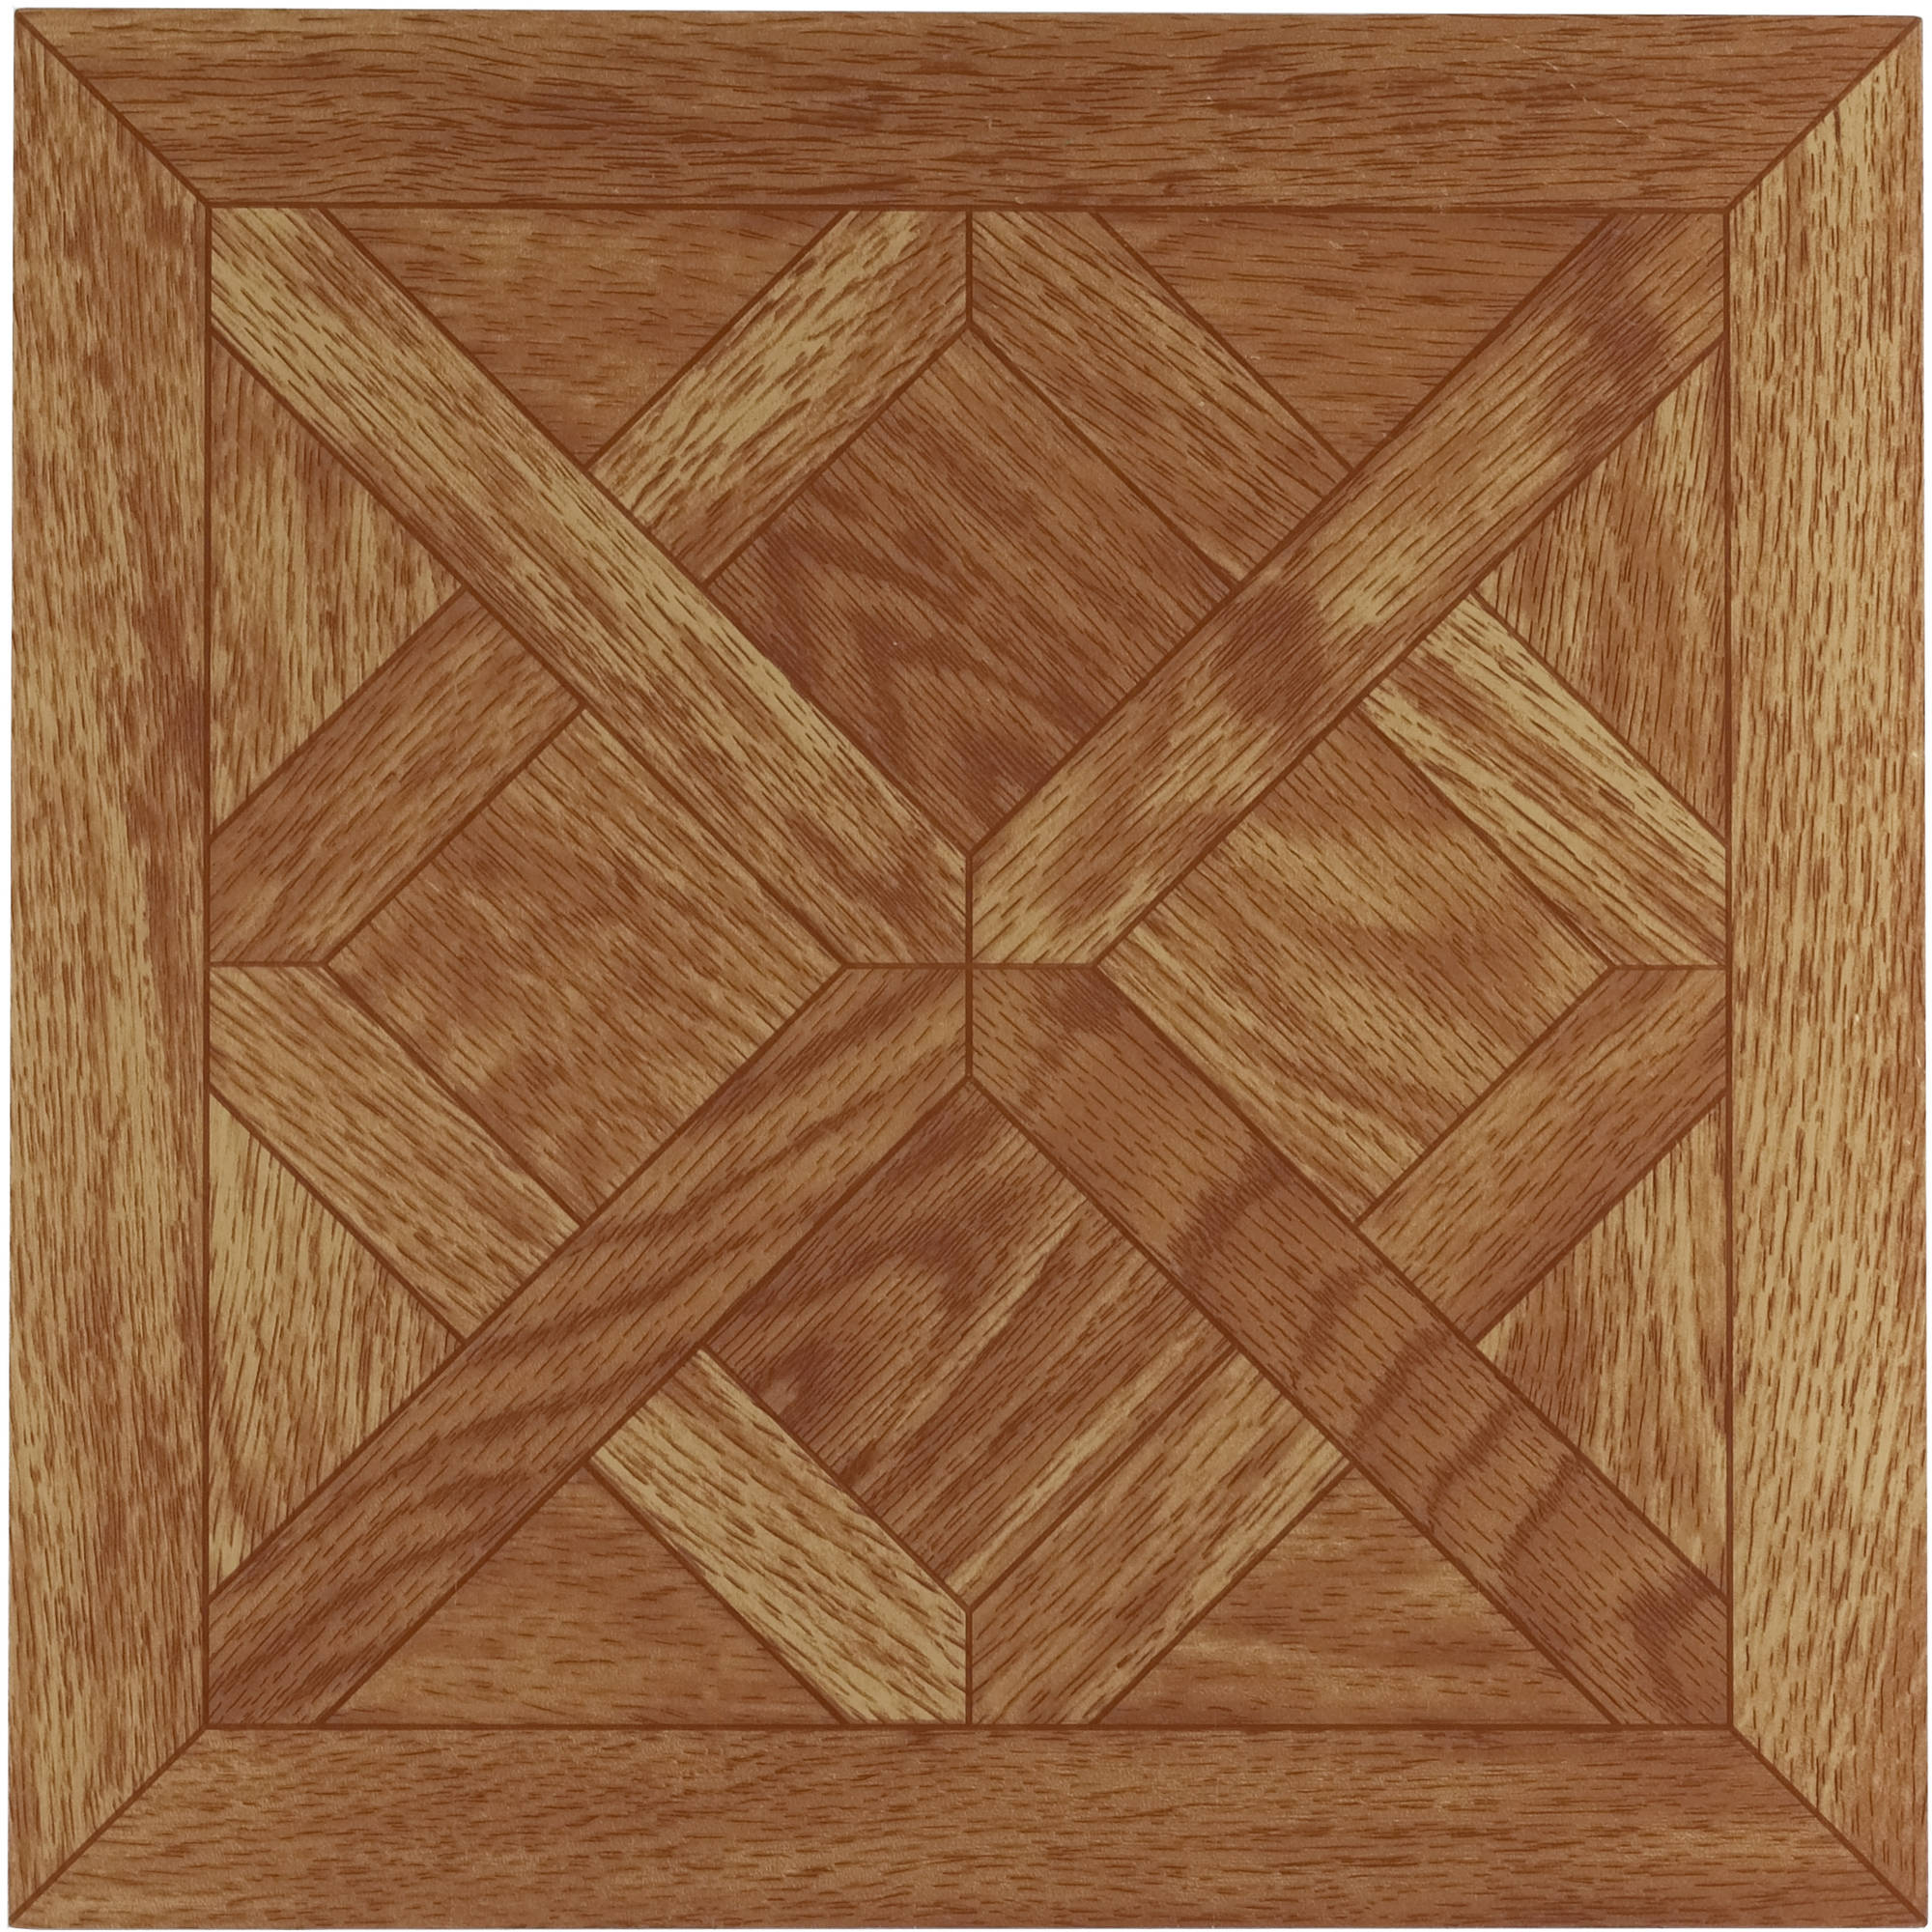 Tivoli classic parquet oak 12x12 self adhesive vinyl floor tile tivoli classic parquet oak 12x12 self adhesive vinyl floor tile 45 tiles45 sqft walmart dailygadgetfo Images